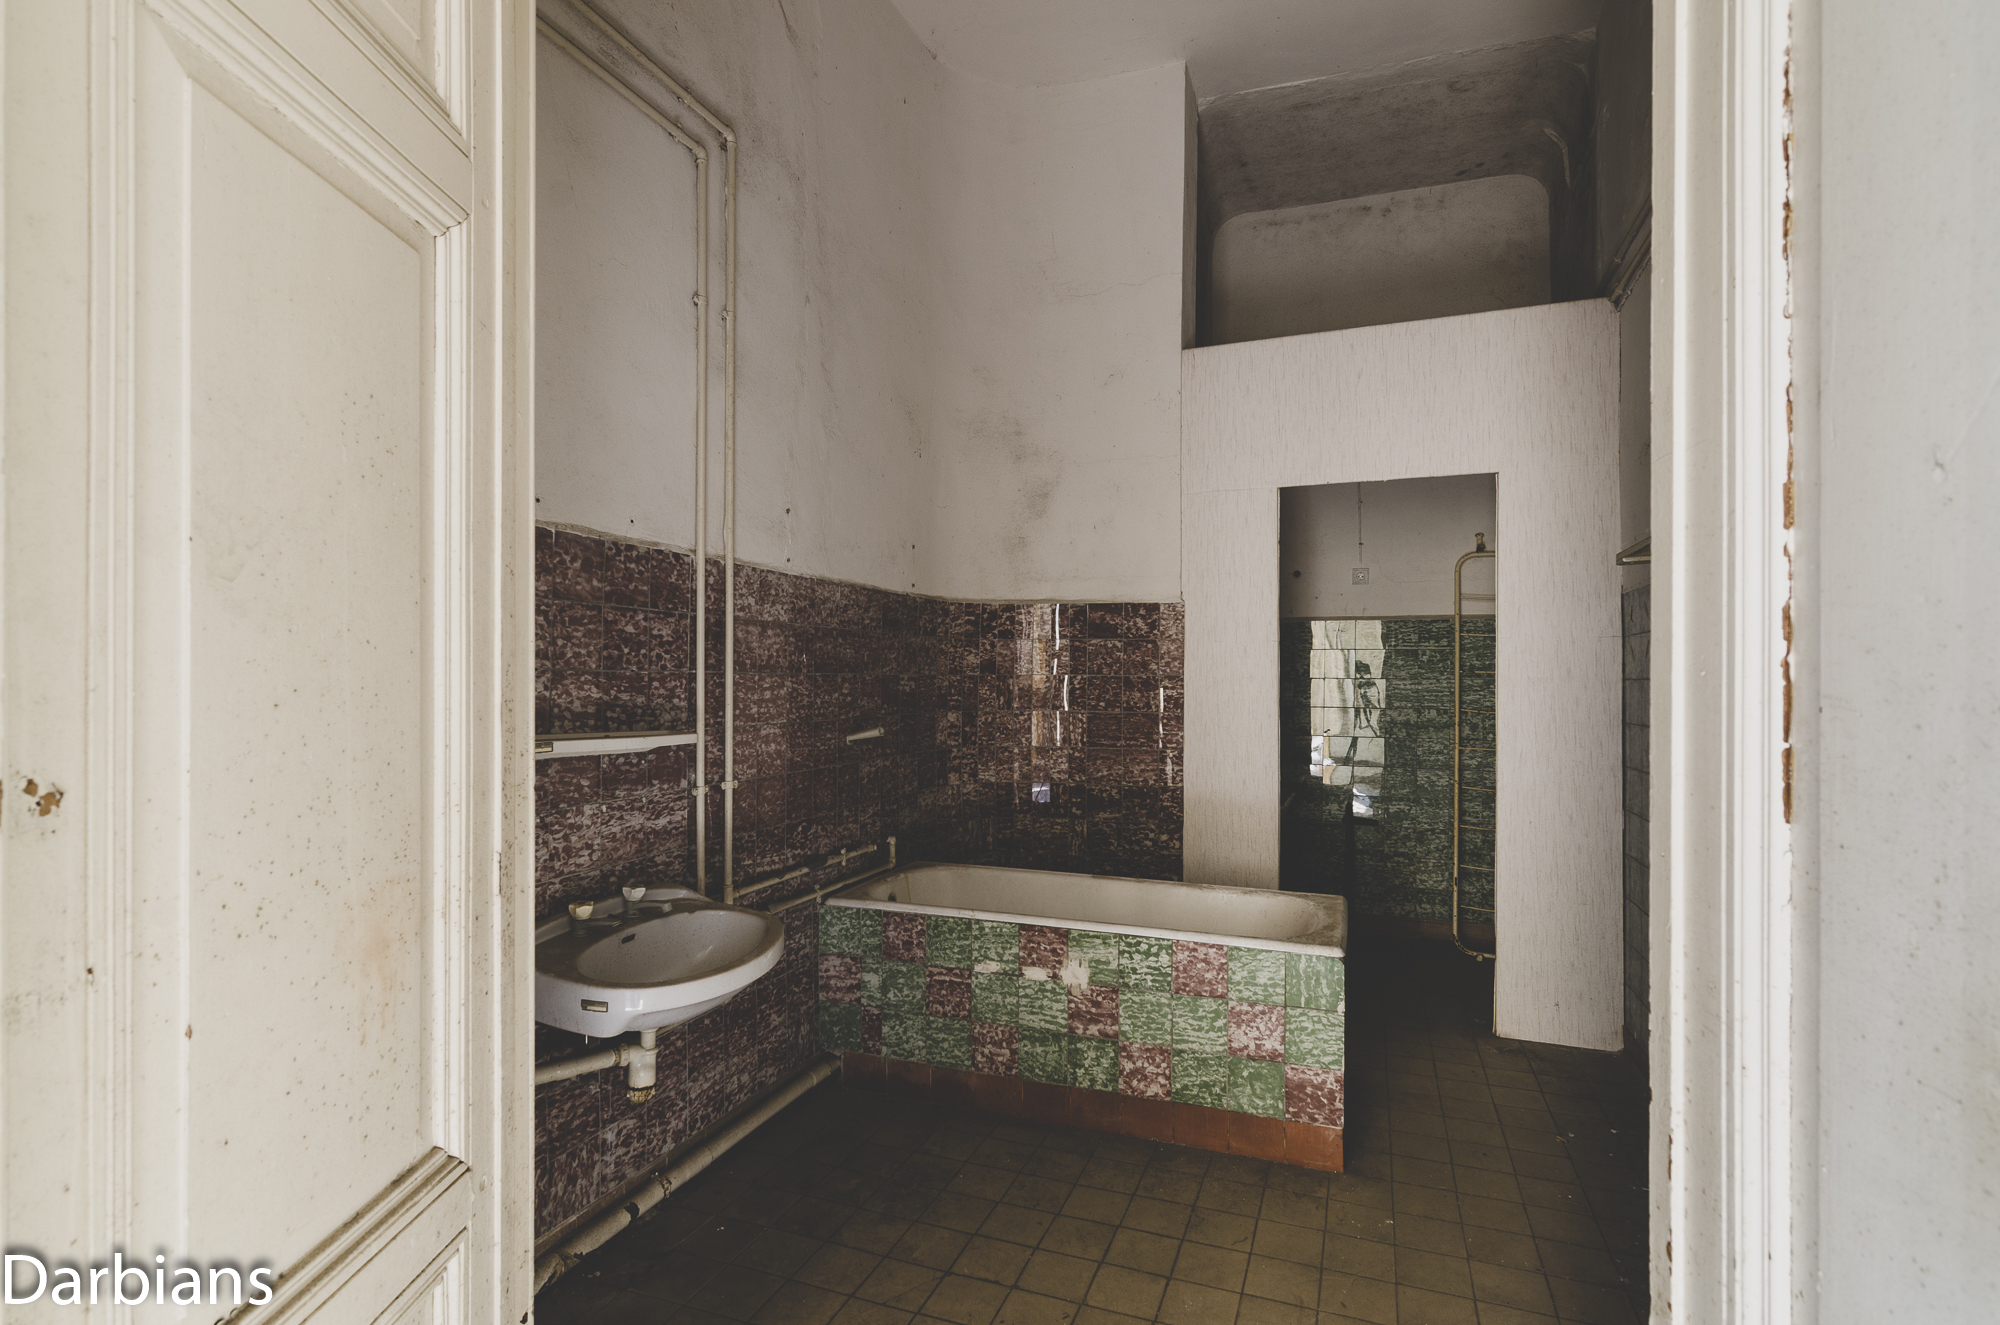 House Of Wheelchairs. Funky bathroom.